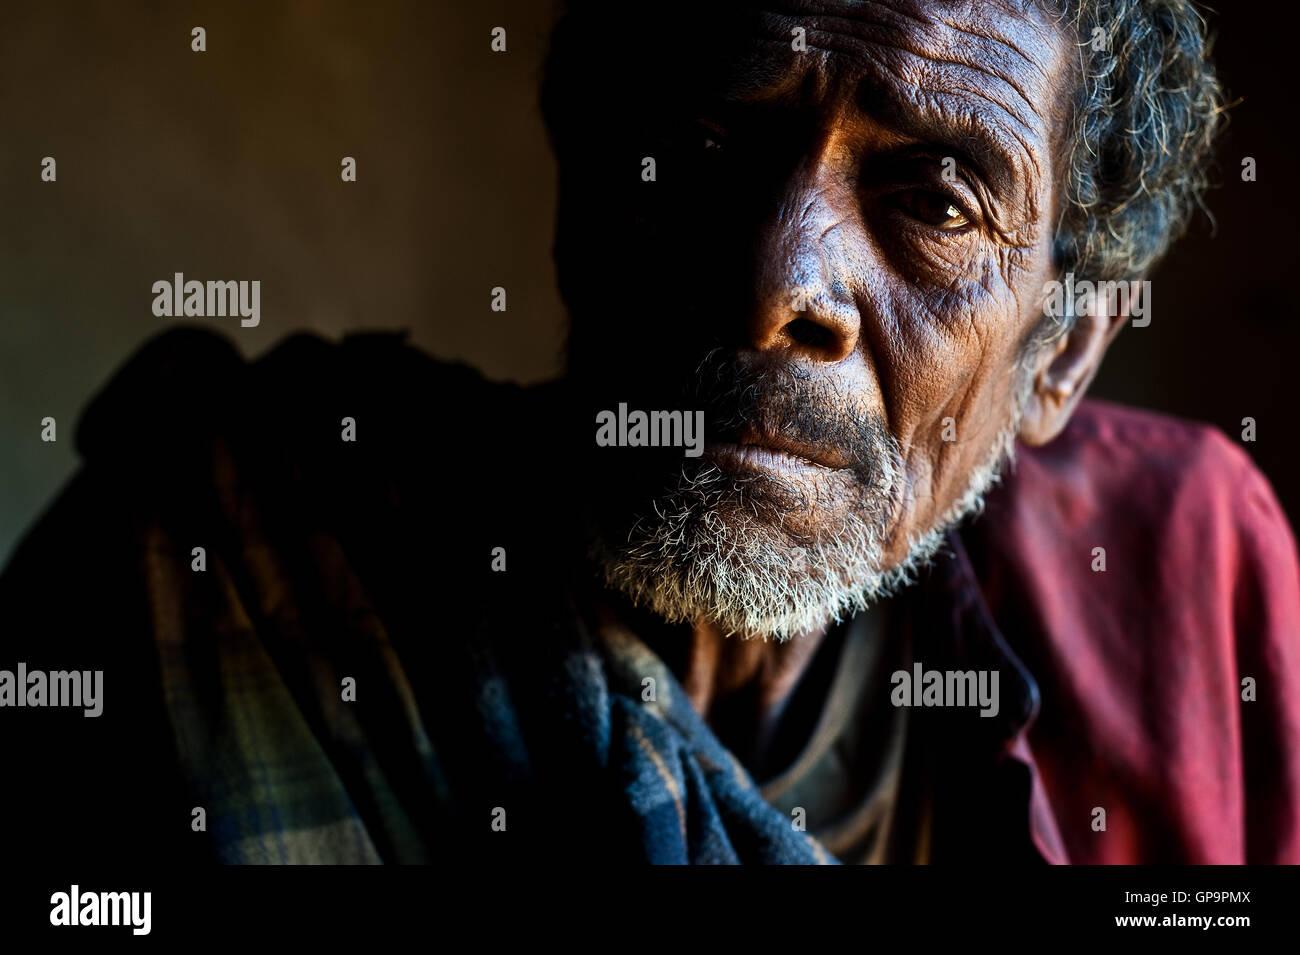 Traditional healer ('ombiasy') ( Madagascar). He belongs to the Betsileo ethnic group. - Stock Image